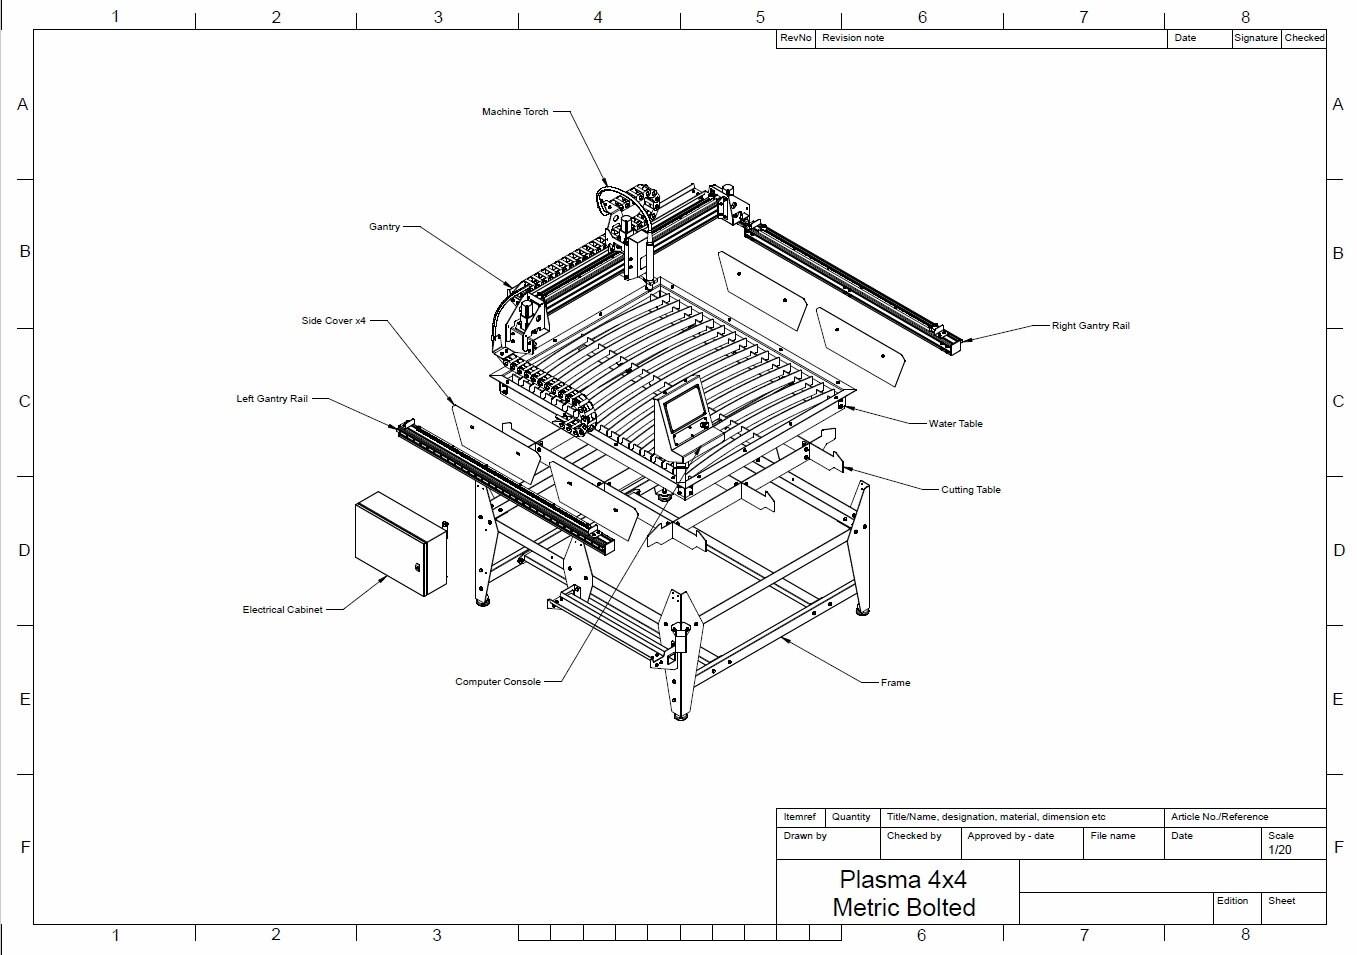 mm x mm 4x4 feet cnc plasma table diy plans from